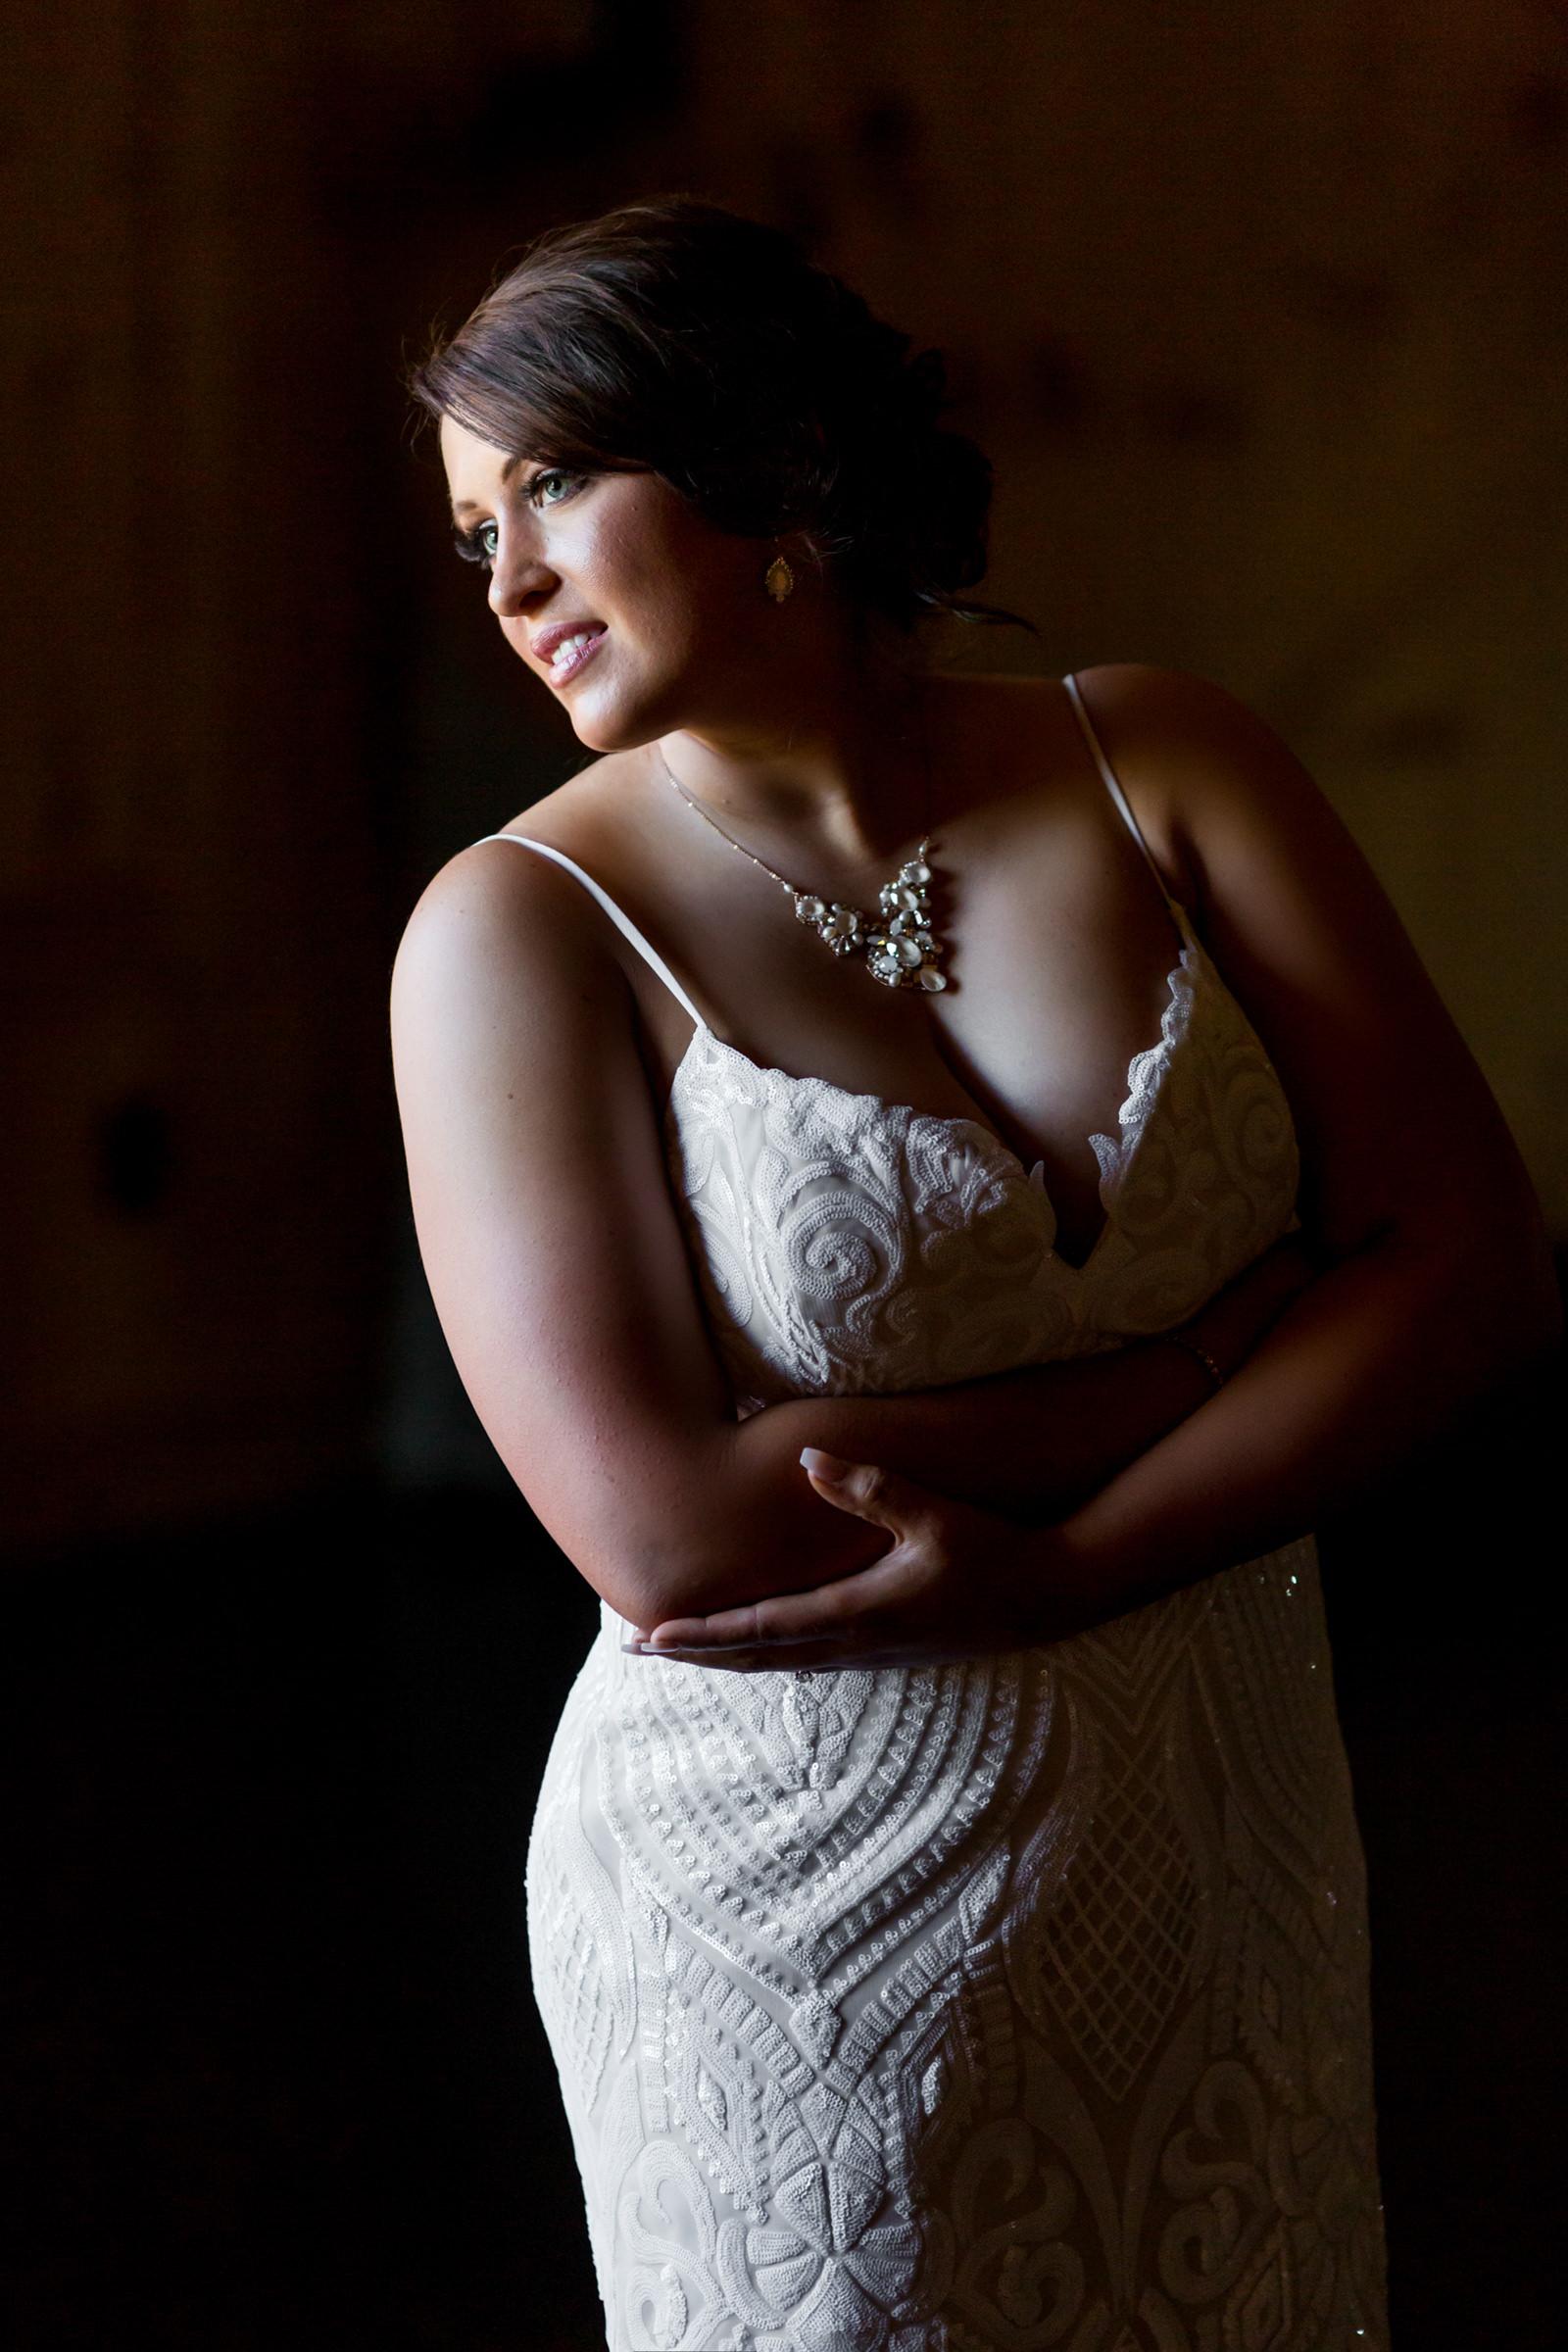 Bride portrait in dramatic light - photo by Procopio Photography